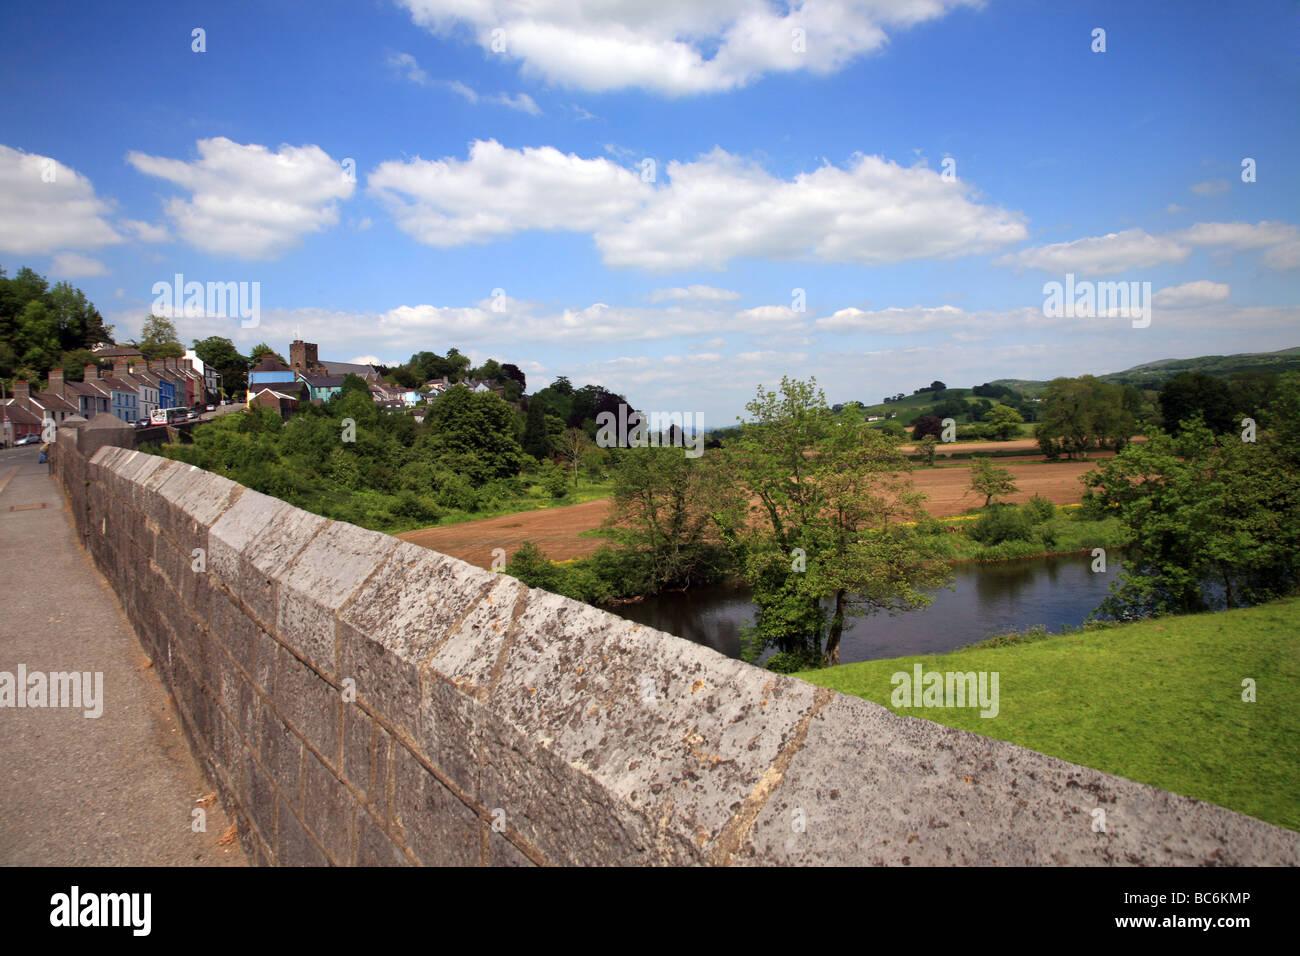 Stone bridge crossing the River Towy below the hillside town of Llandeilo - Stock Image